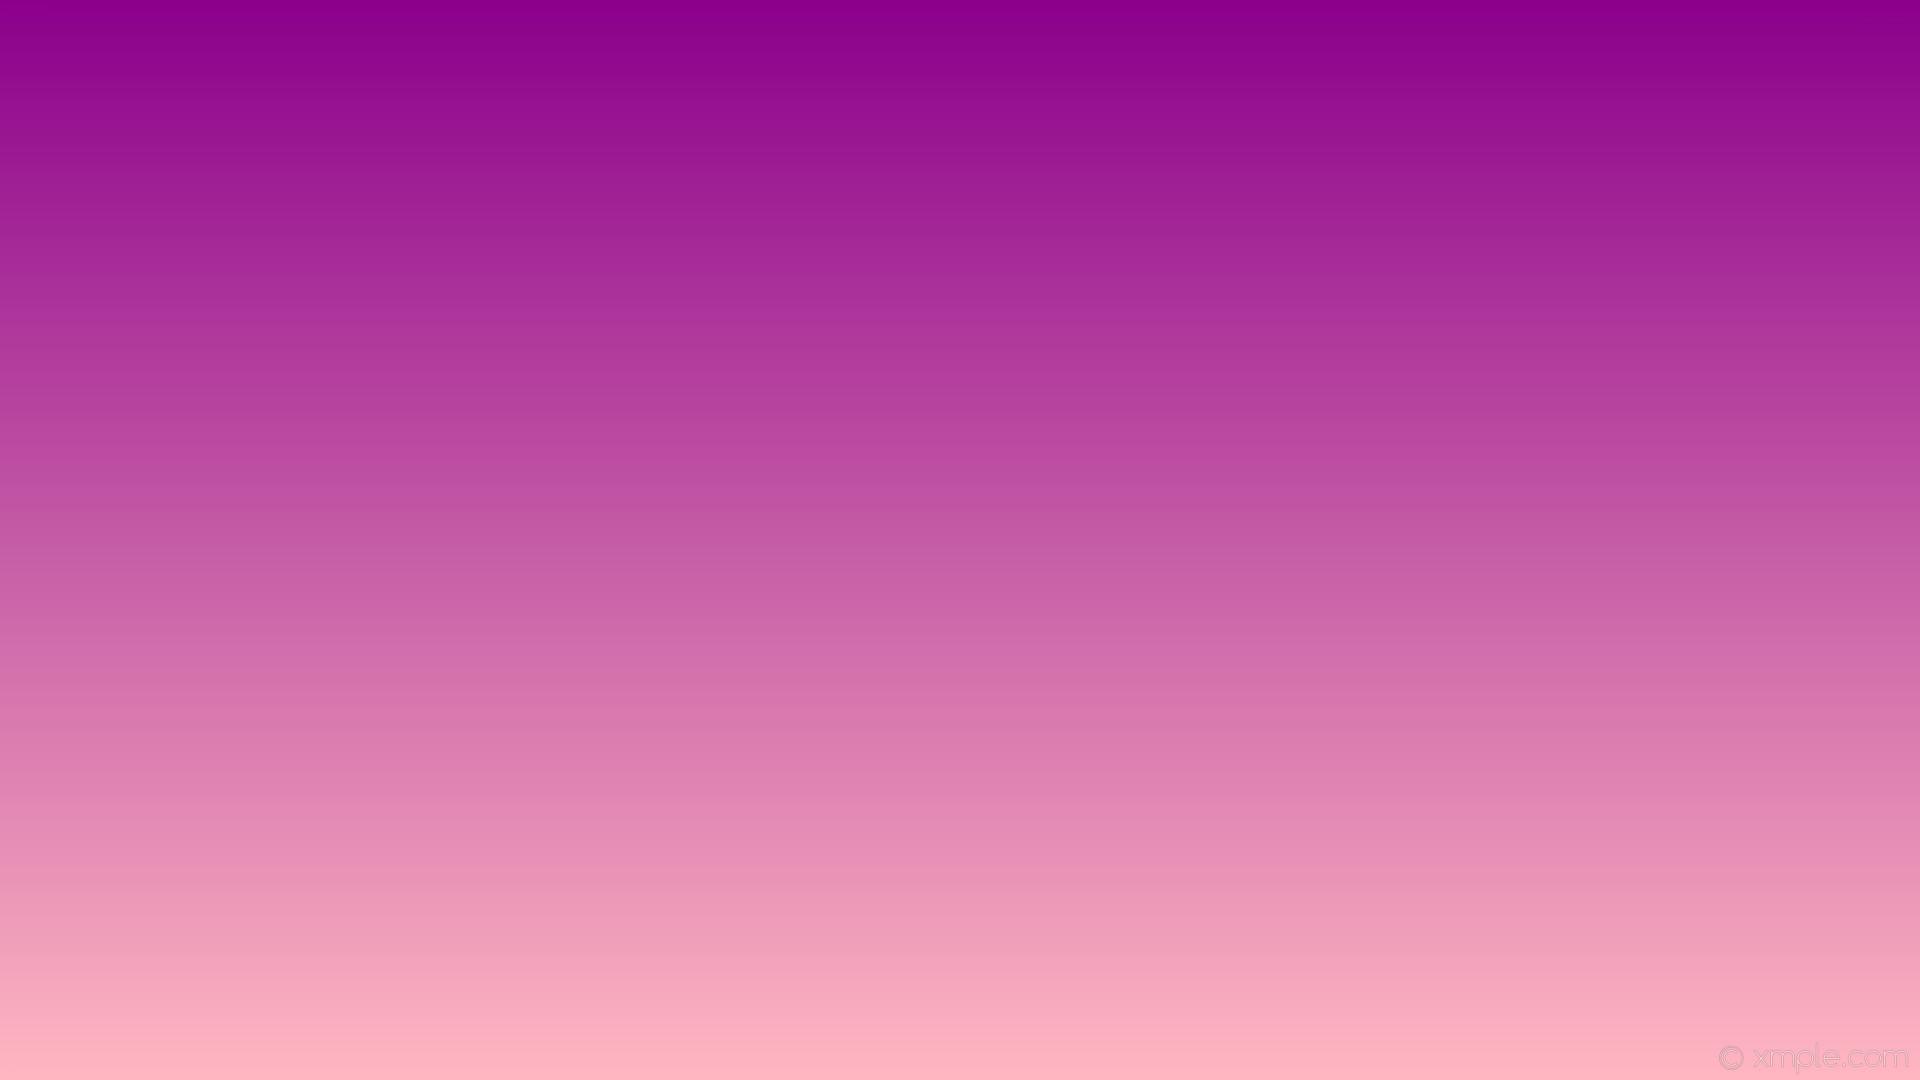 wallpaper gradient purple linear pink dark magenta light pink #8b008b  #ffb6c1 90°